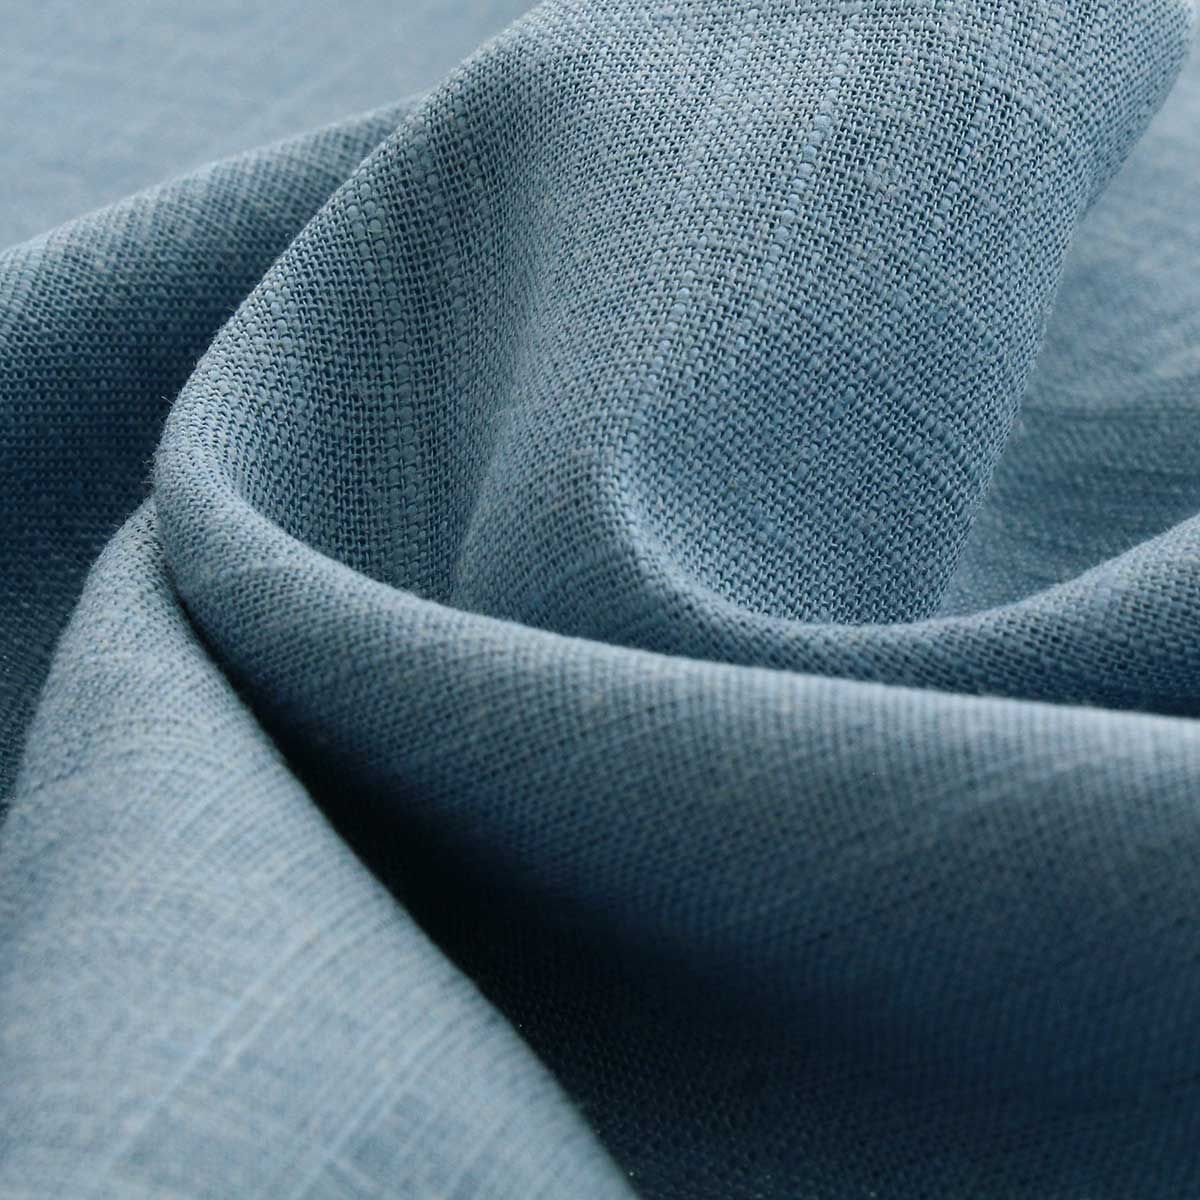 Tissu lin viscose - Bleu vintage clair